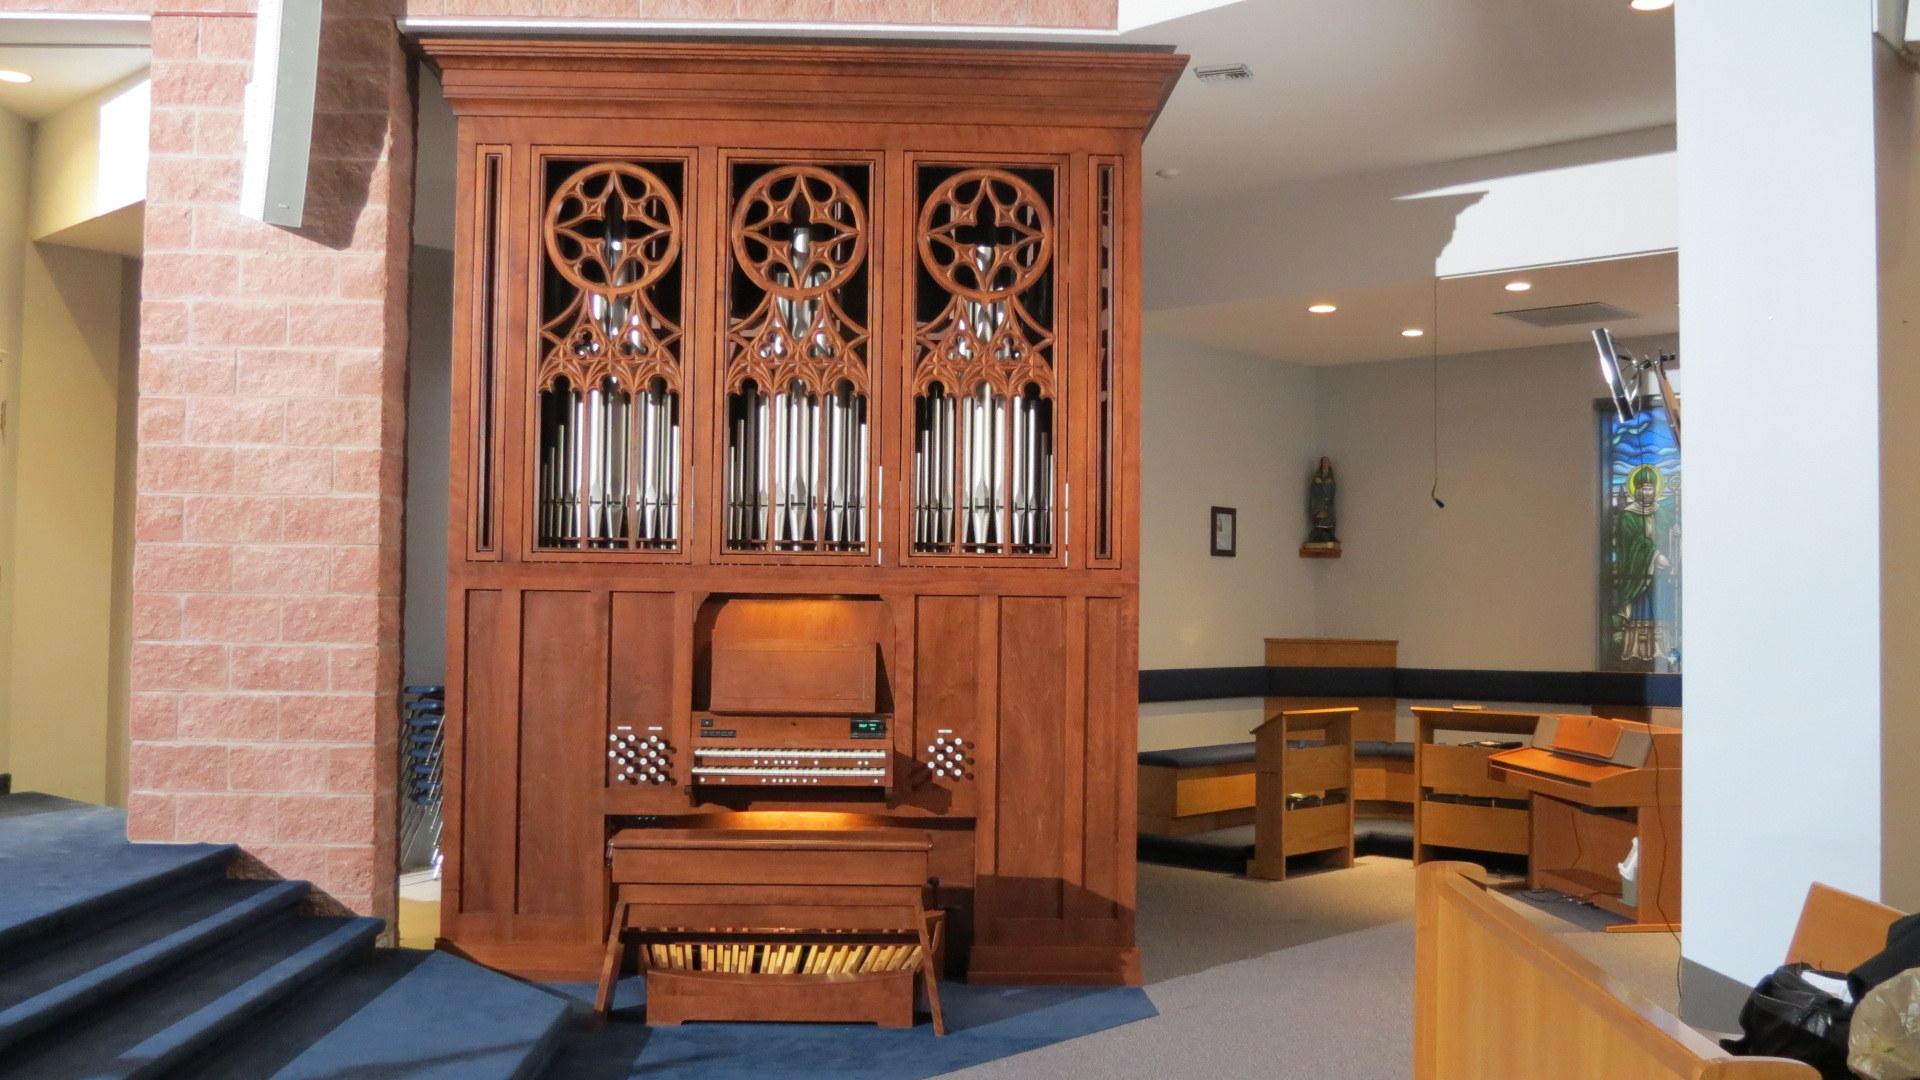 Orgue Inspiration installé à l'église Immaculée-Conception de Port Perry, Ontario